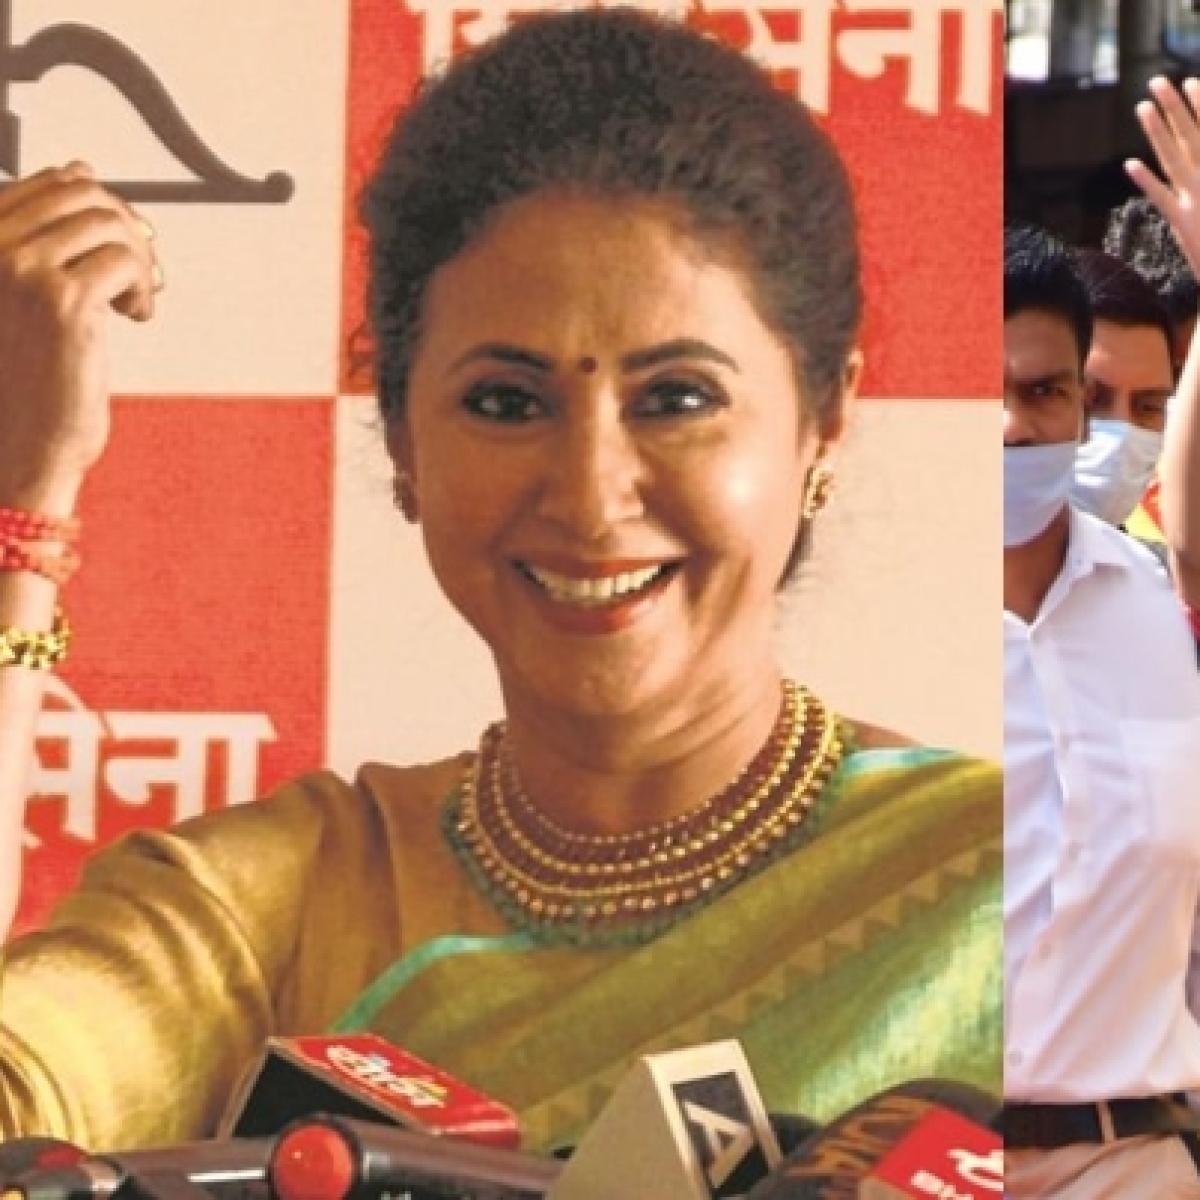 'Has she fallen on her head?': Urmila Matondkar takes a jibe at Kangana Ranaut's 'my beloved city Mumbai' tweet